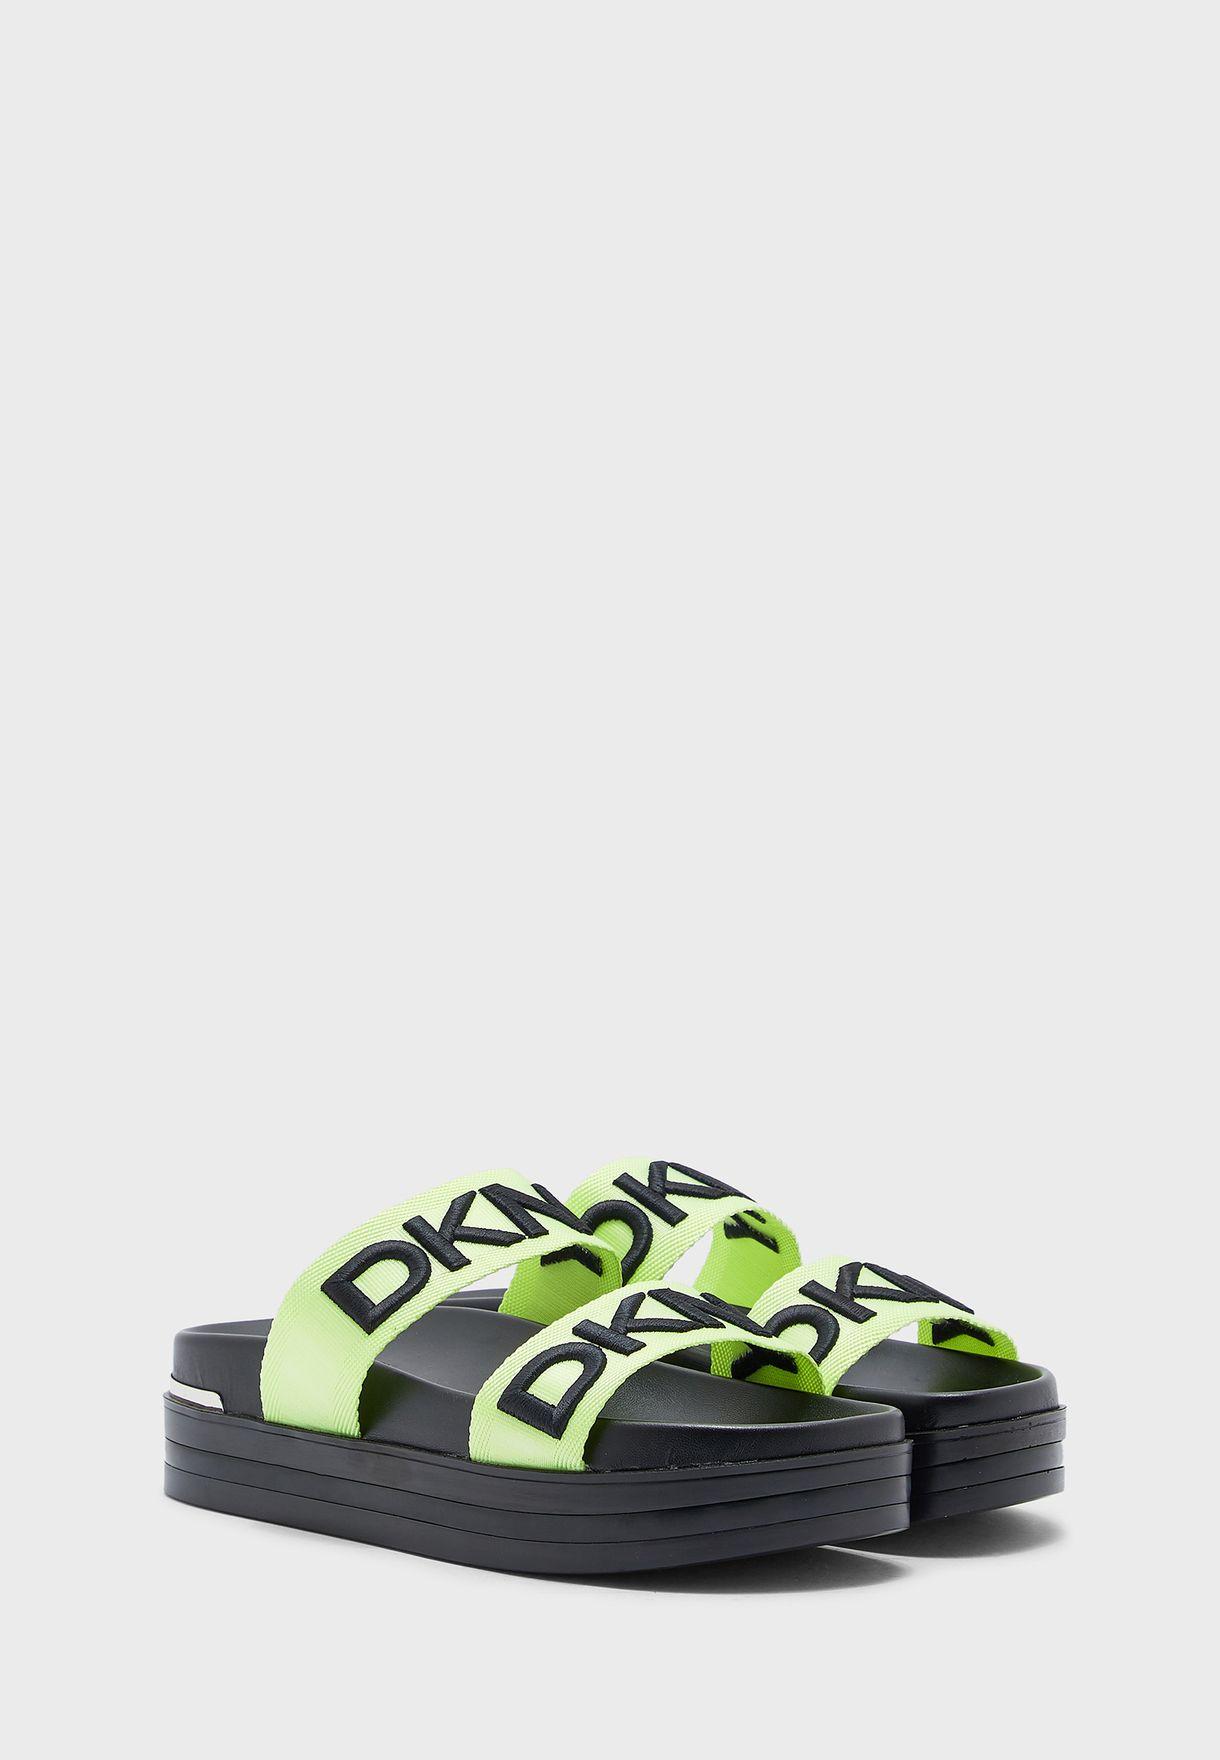 Tee Flat Sandals